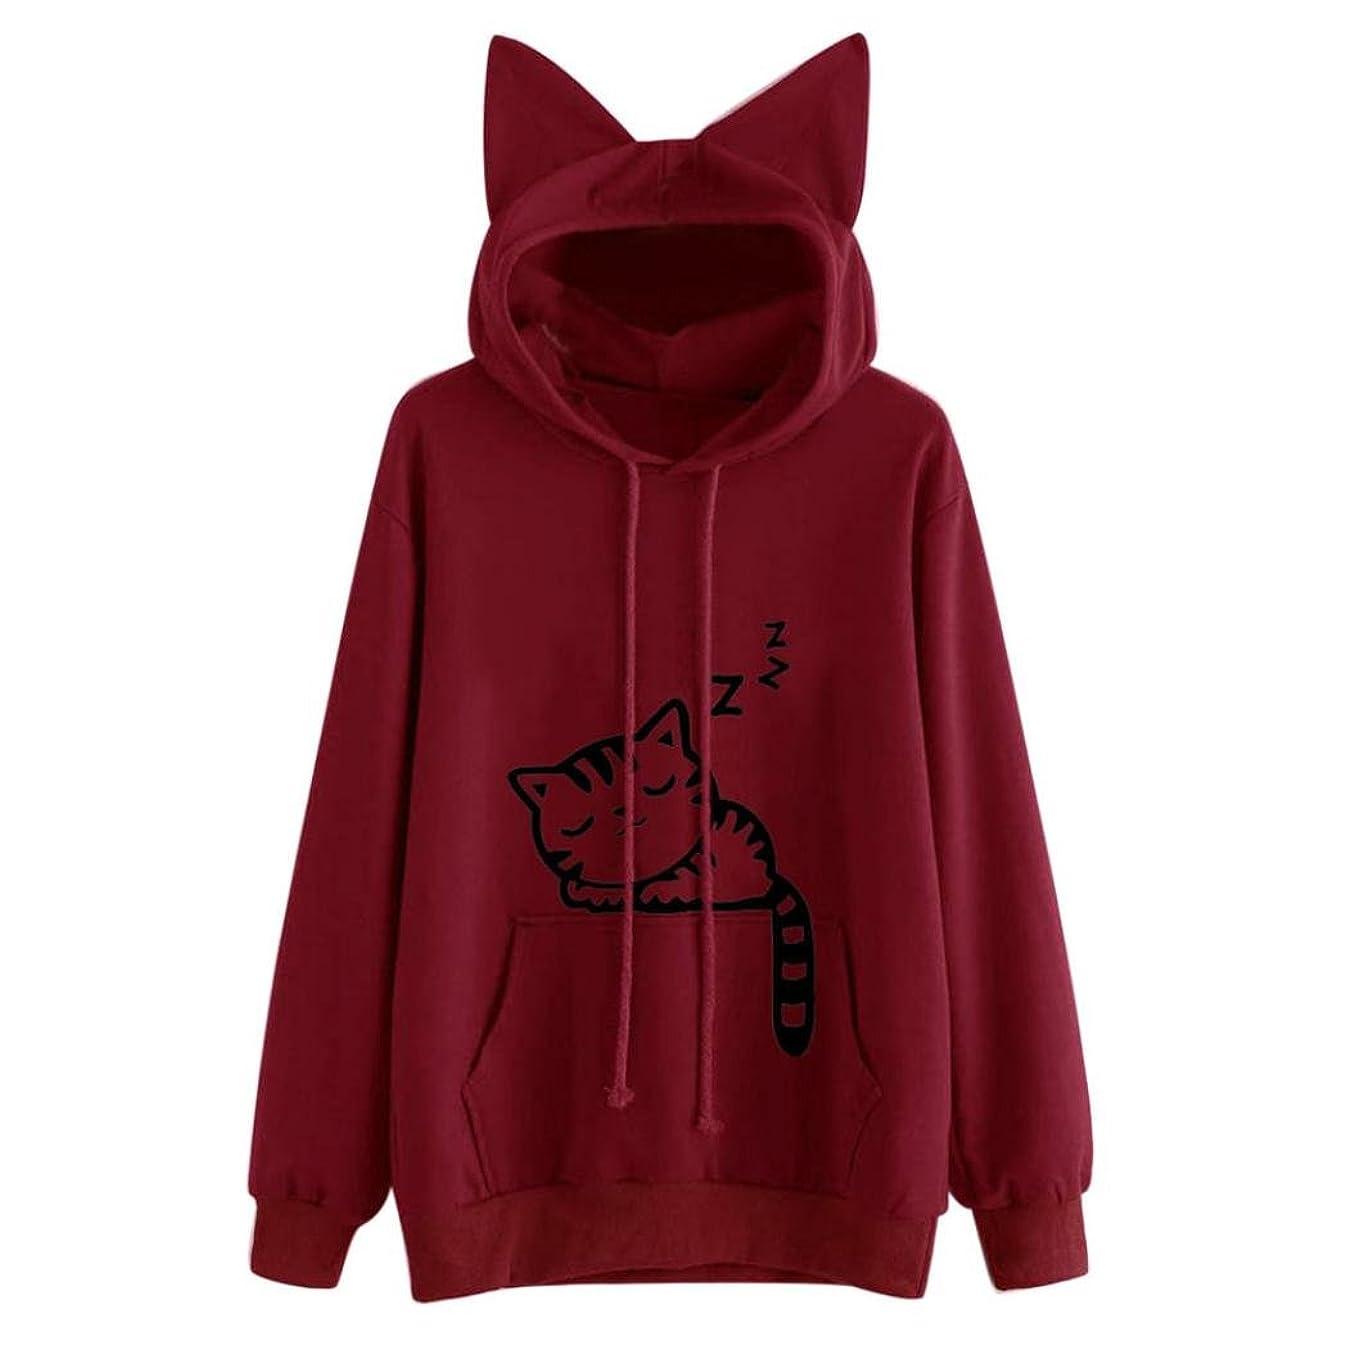 Start Women's Long Sleeves Cat Blouse Hooded Pullover Casual Sweatshirt Tops